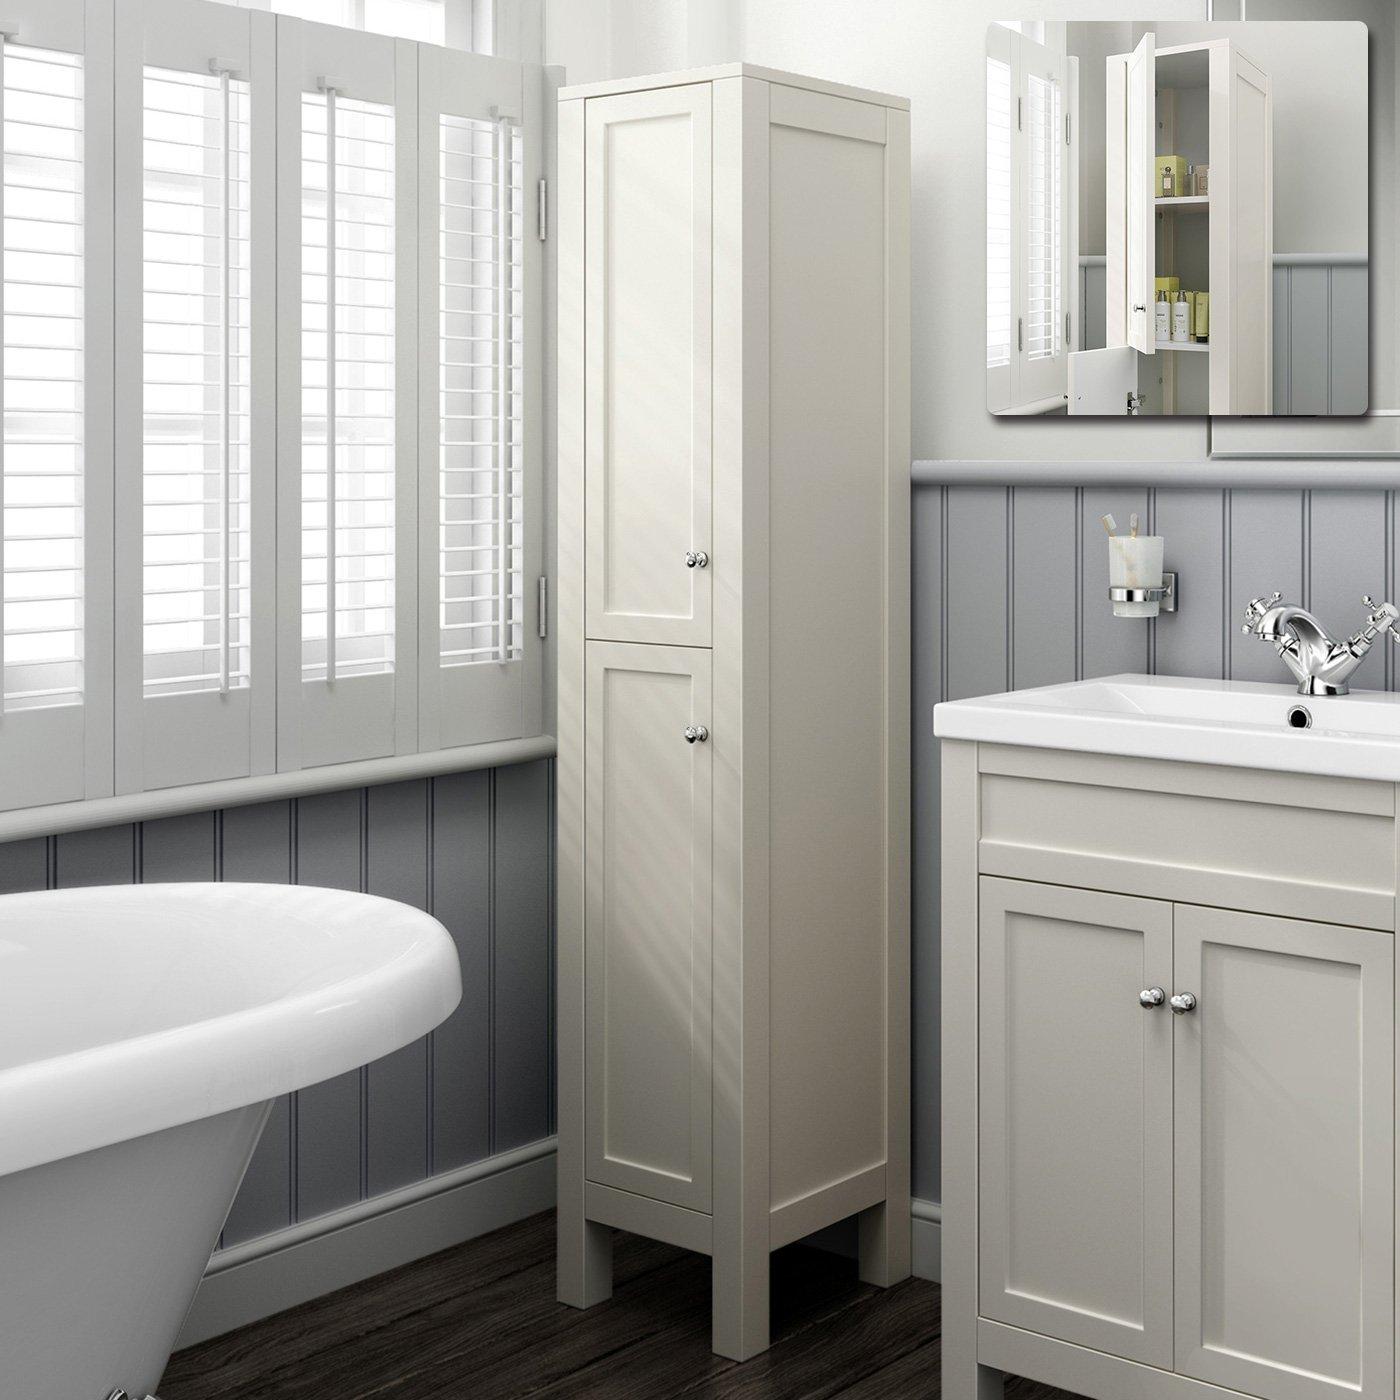 1600mm Tall Ivory Floor Standing Bathroom Furniture Cabinet Storage Unit  Mf1010: Ibathuk: Amazon: Kitchen & Home